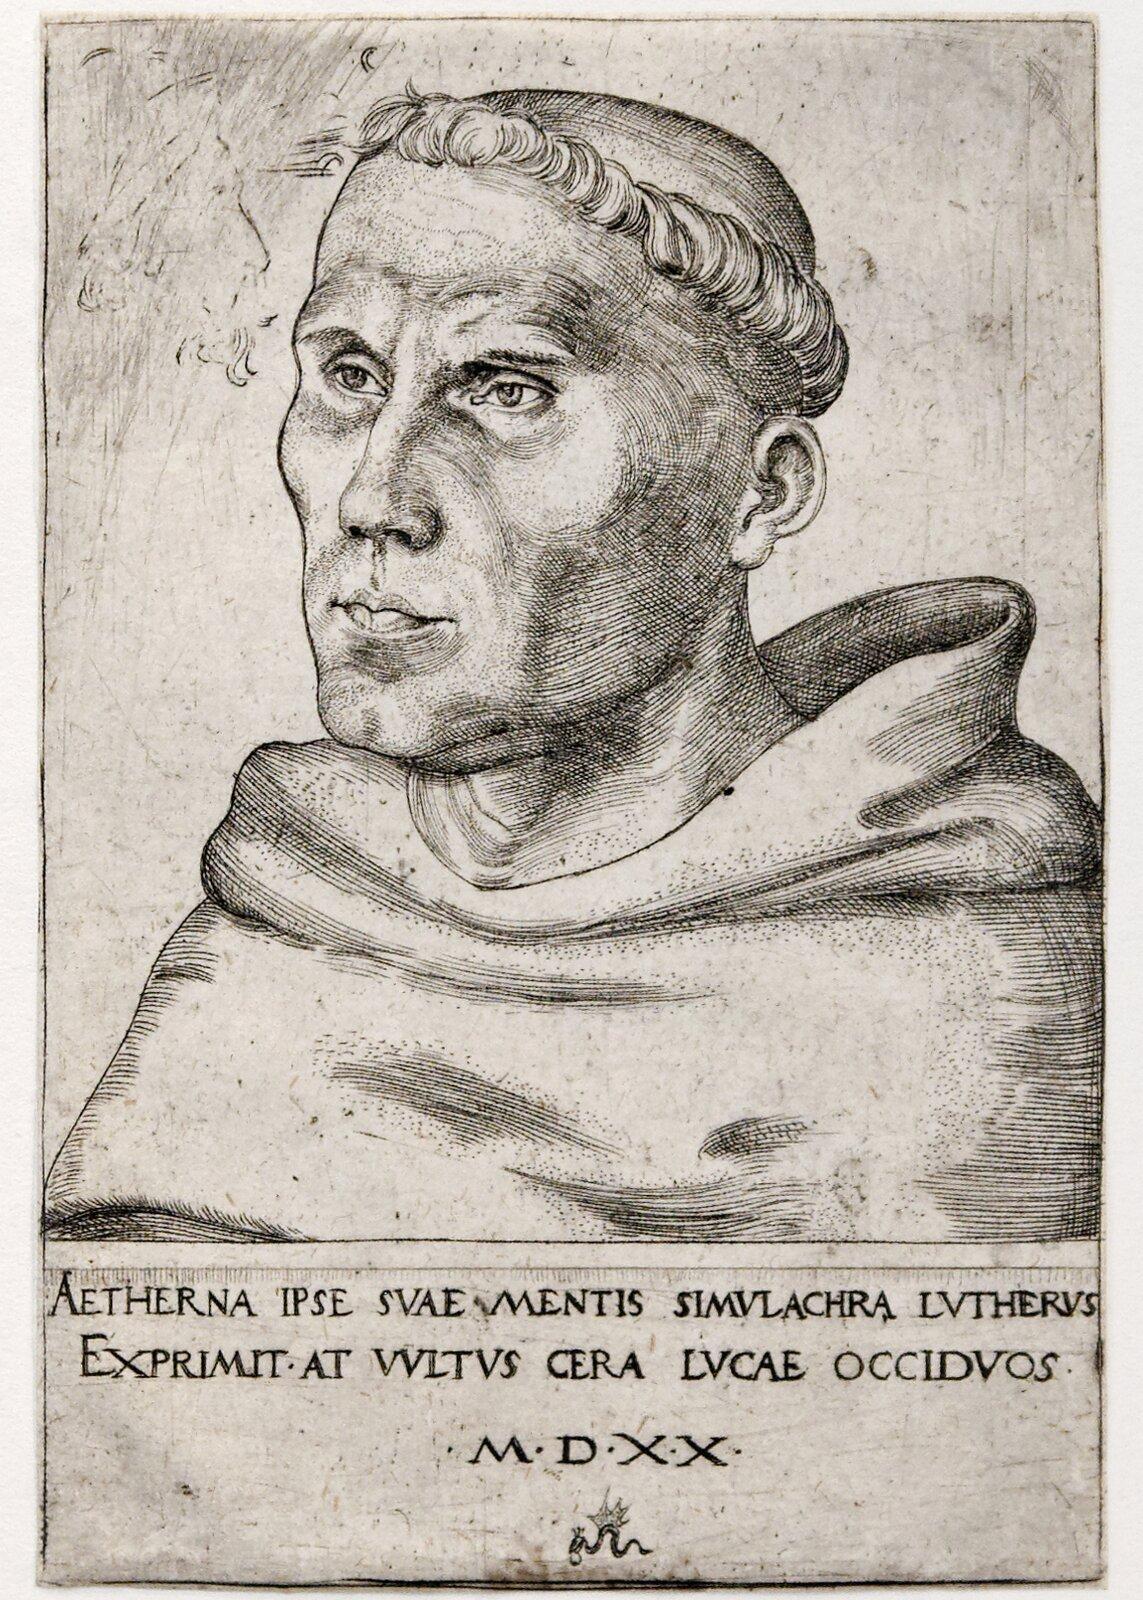 Marcin Luter jako mnich Źródło: Lucas Cranach młodszy, Marcin Luter jako mnich, 1520, miedzioryt, Victoria and Albert Museum, domena publiczna.